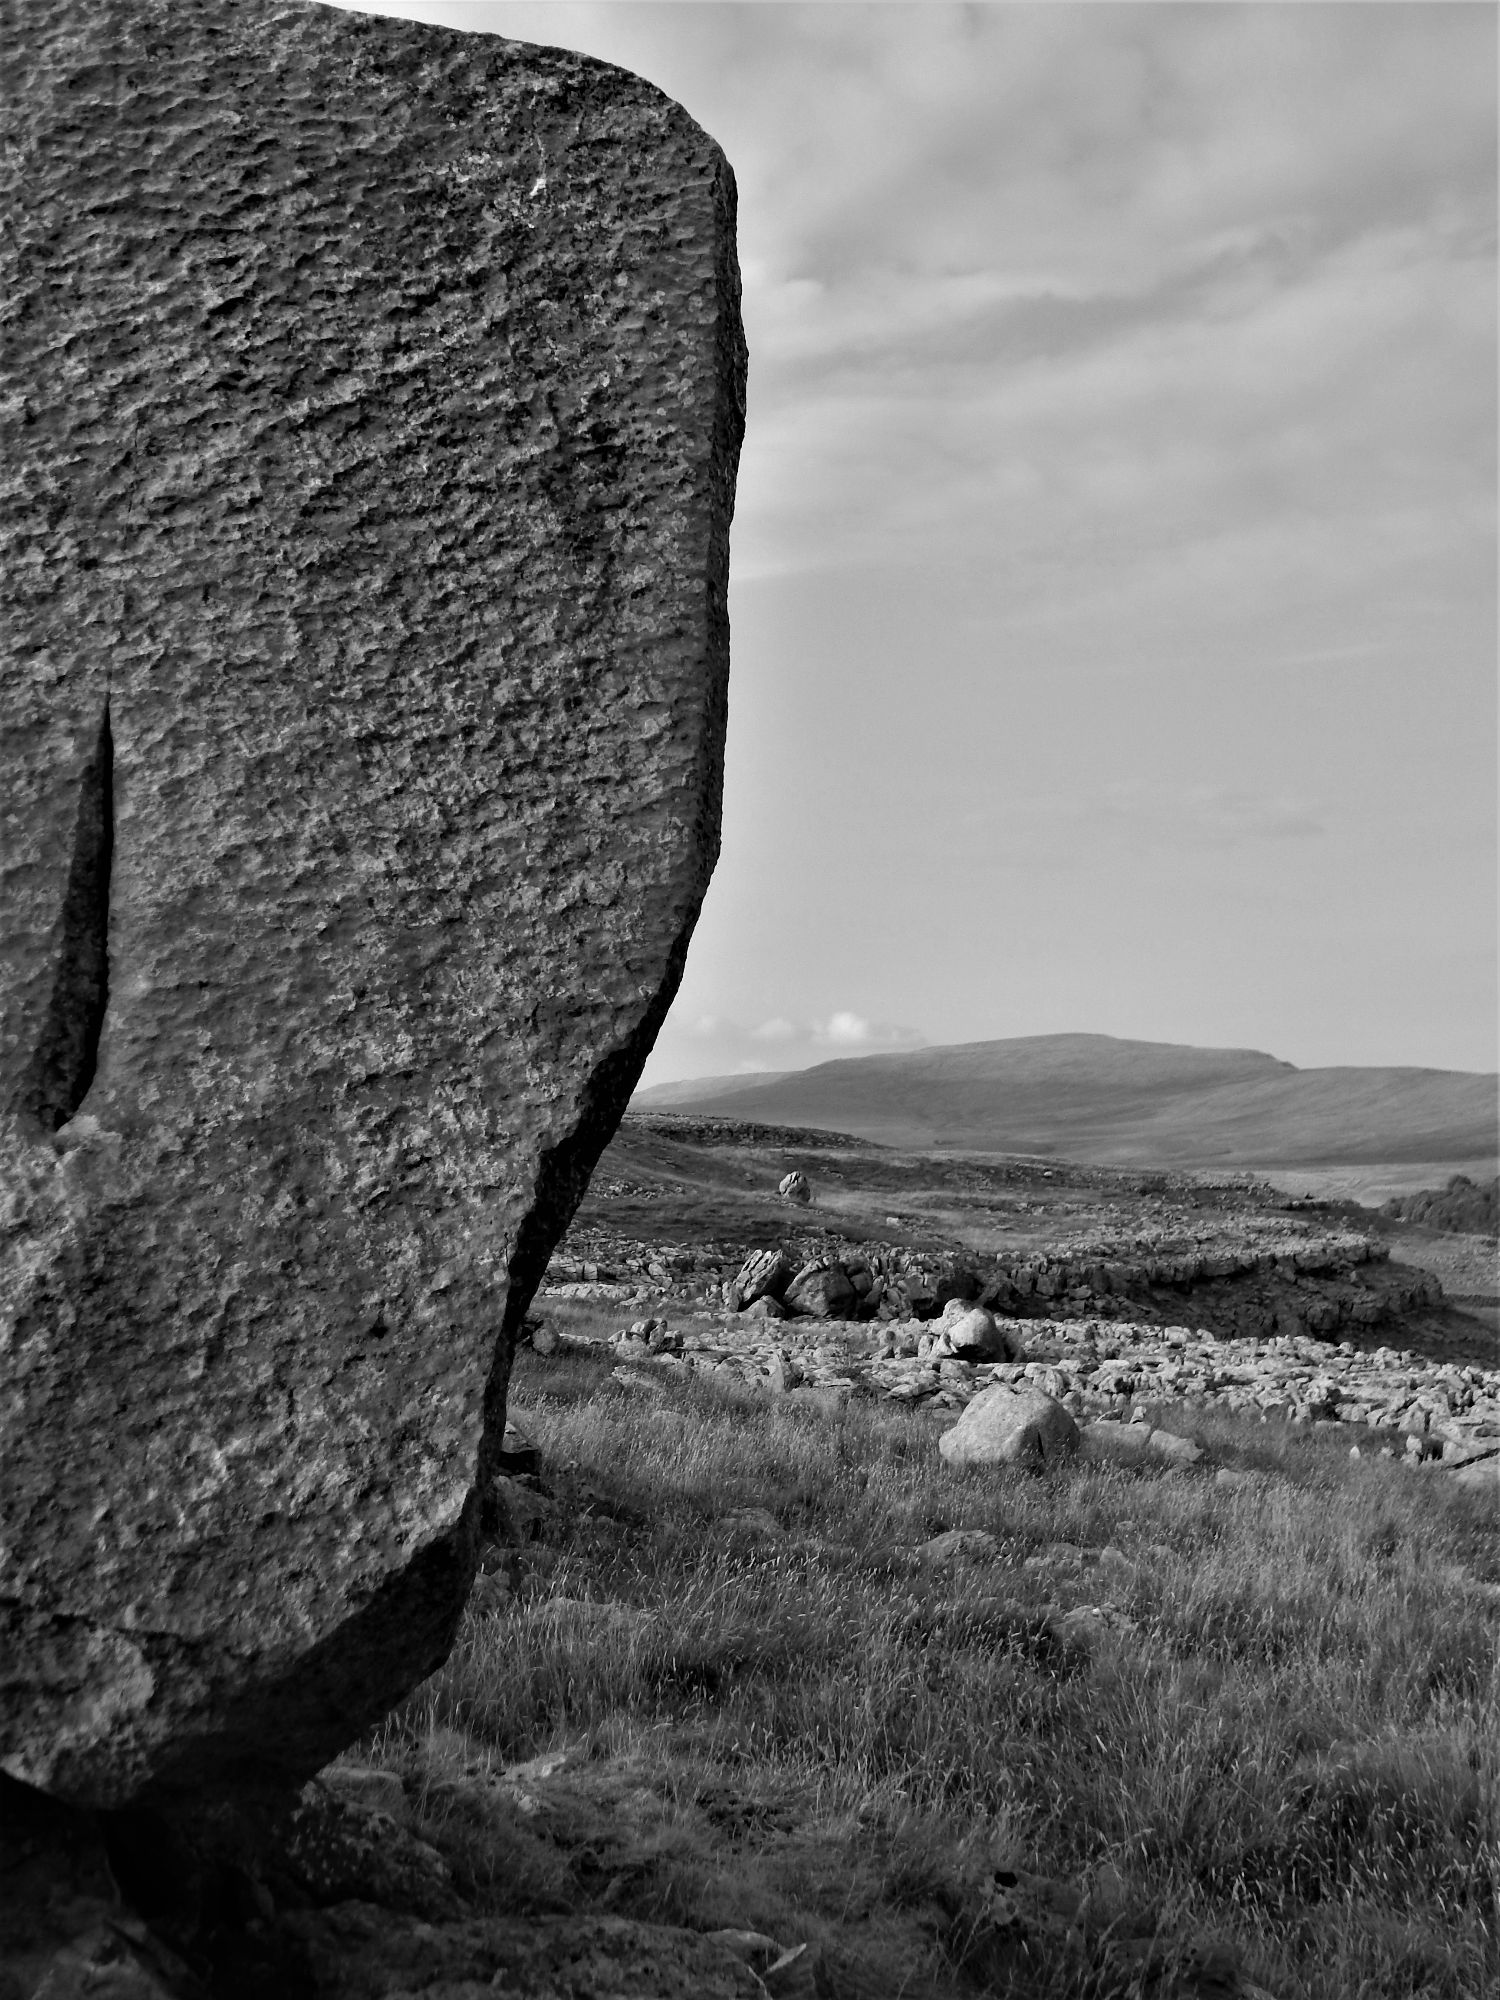 Cheese Press Stones towards Whernside